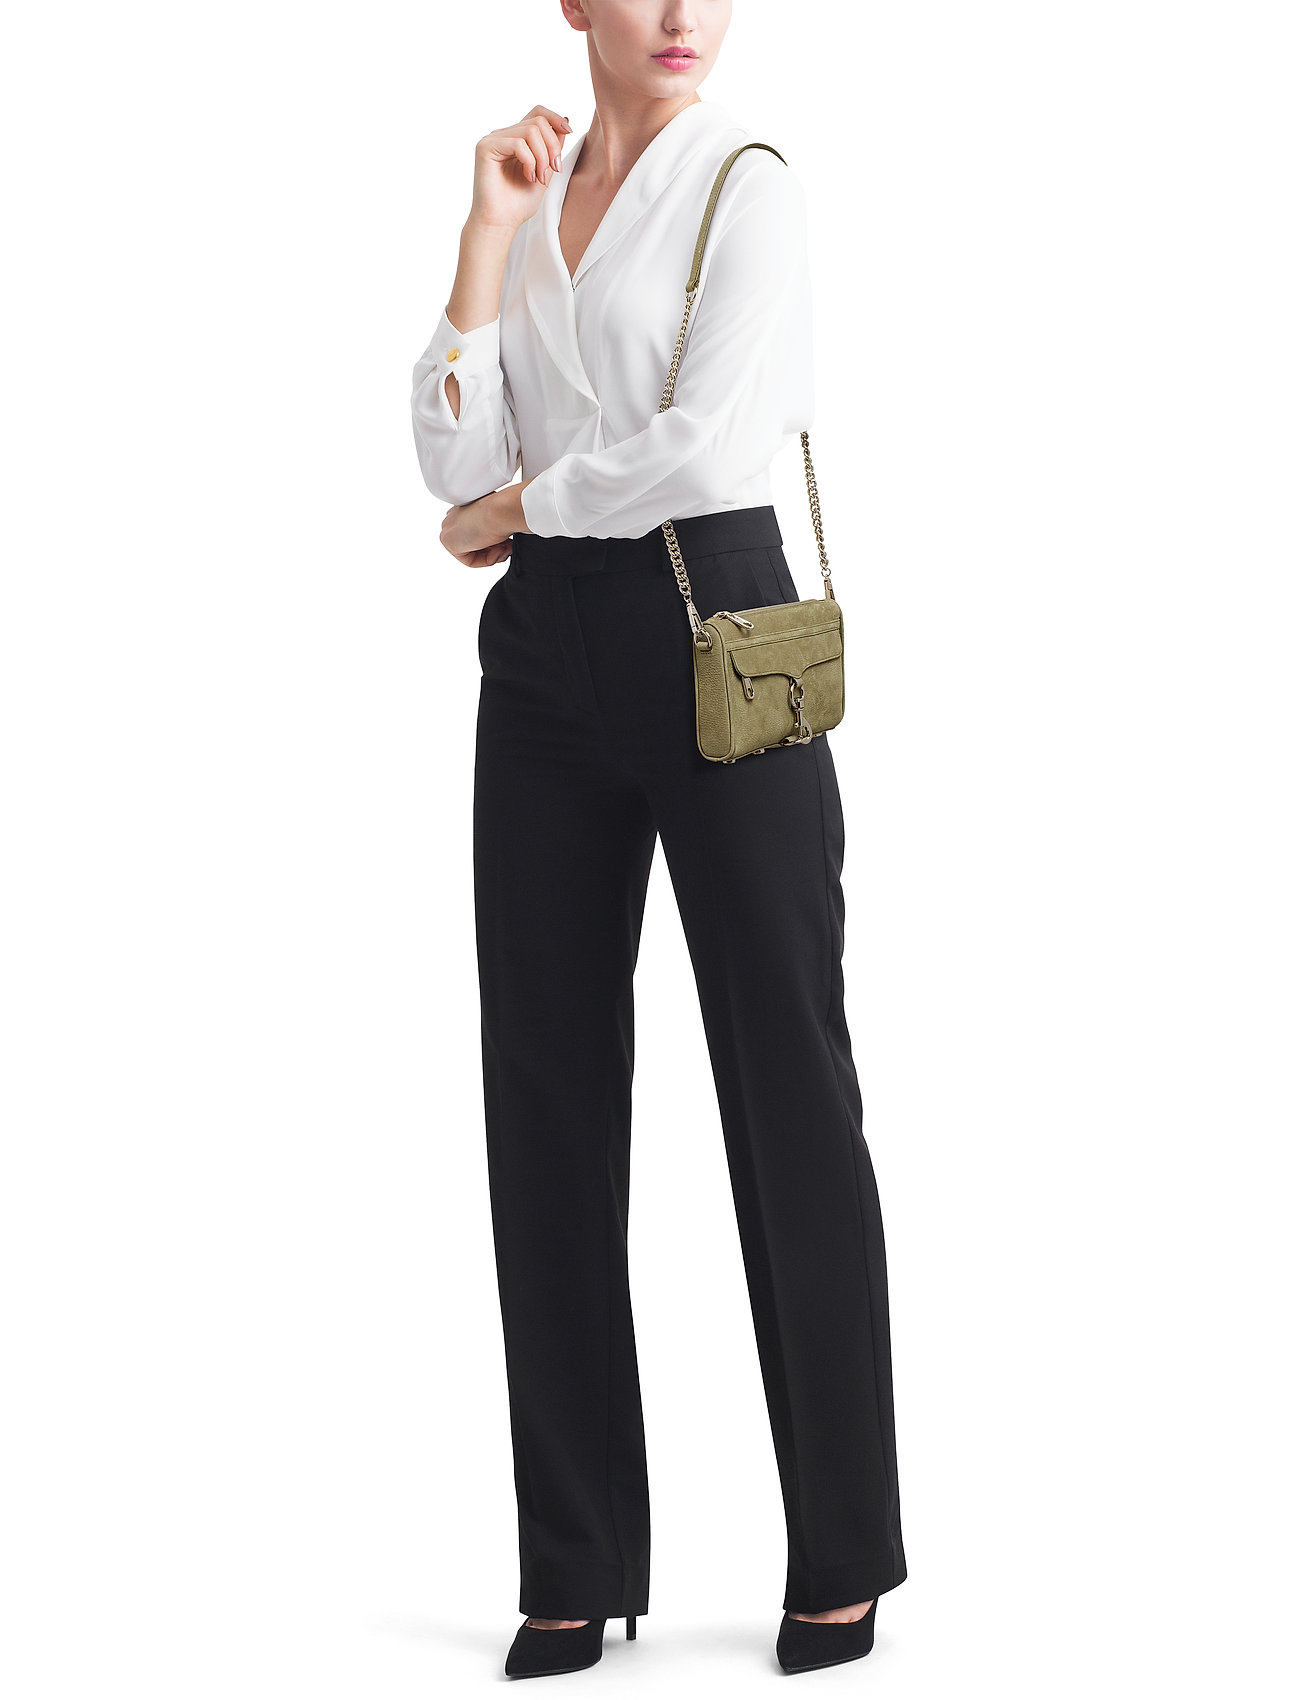 Rebecca Minkoff Mini Mac Nubuck  With The Strap In Leather - 028 THYME